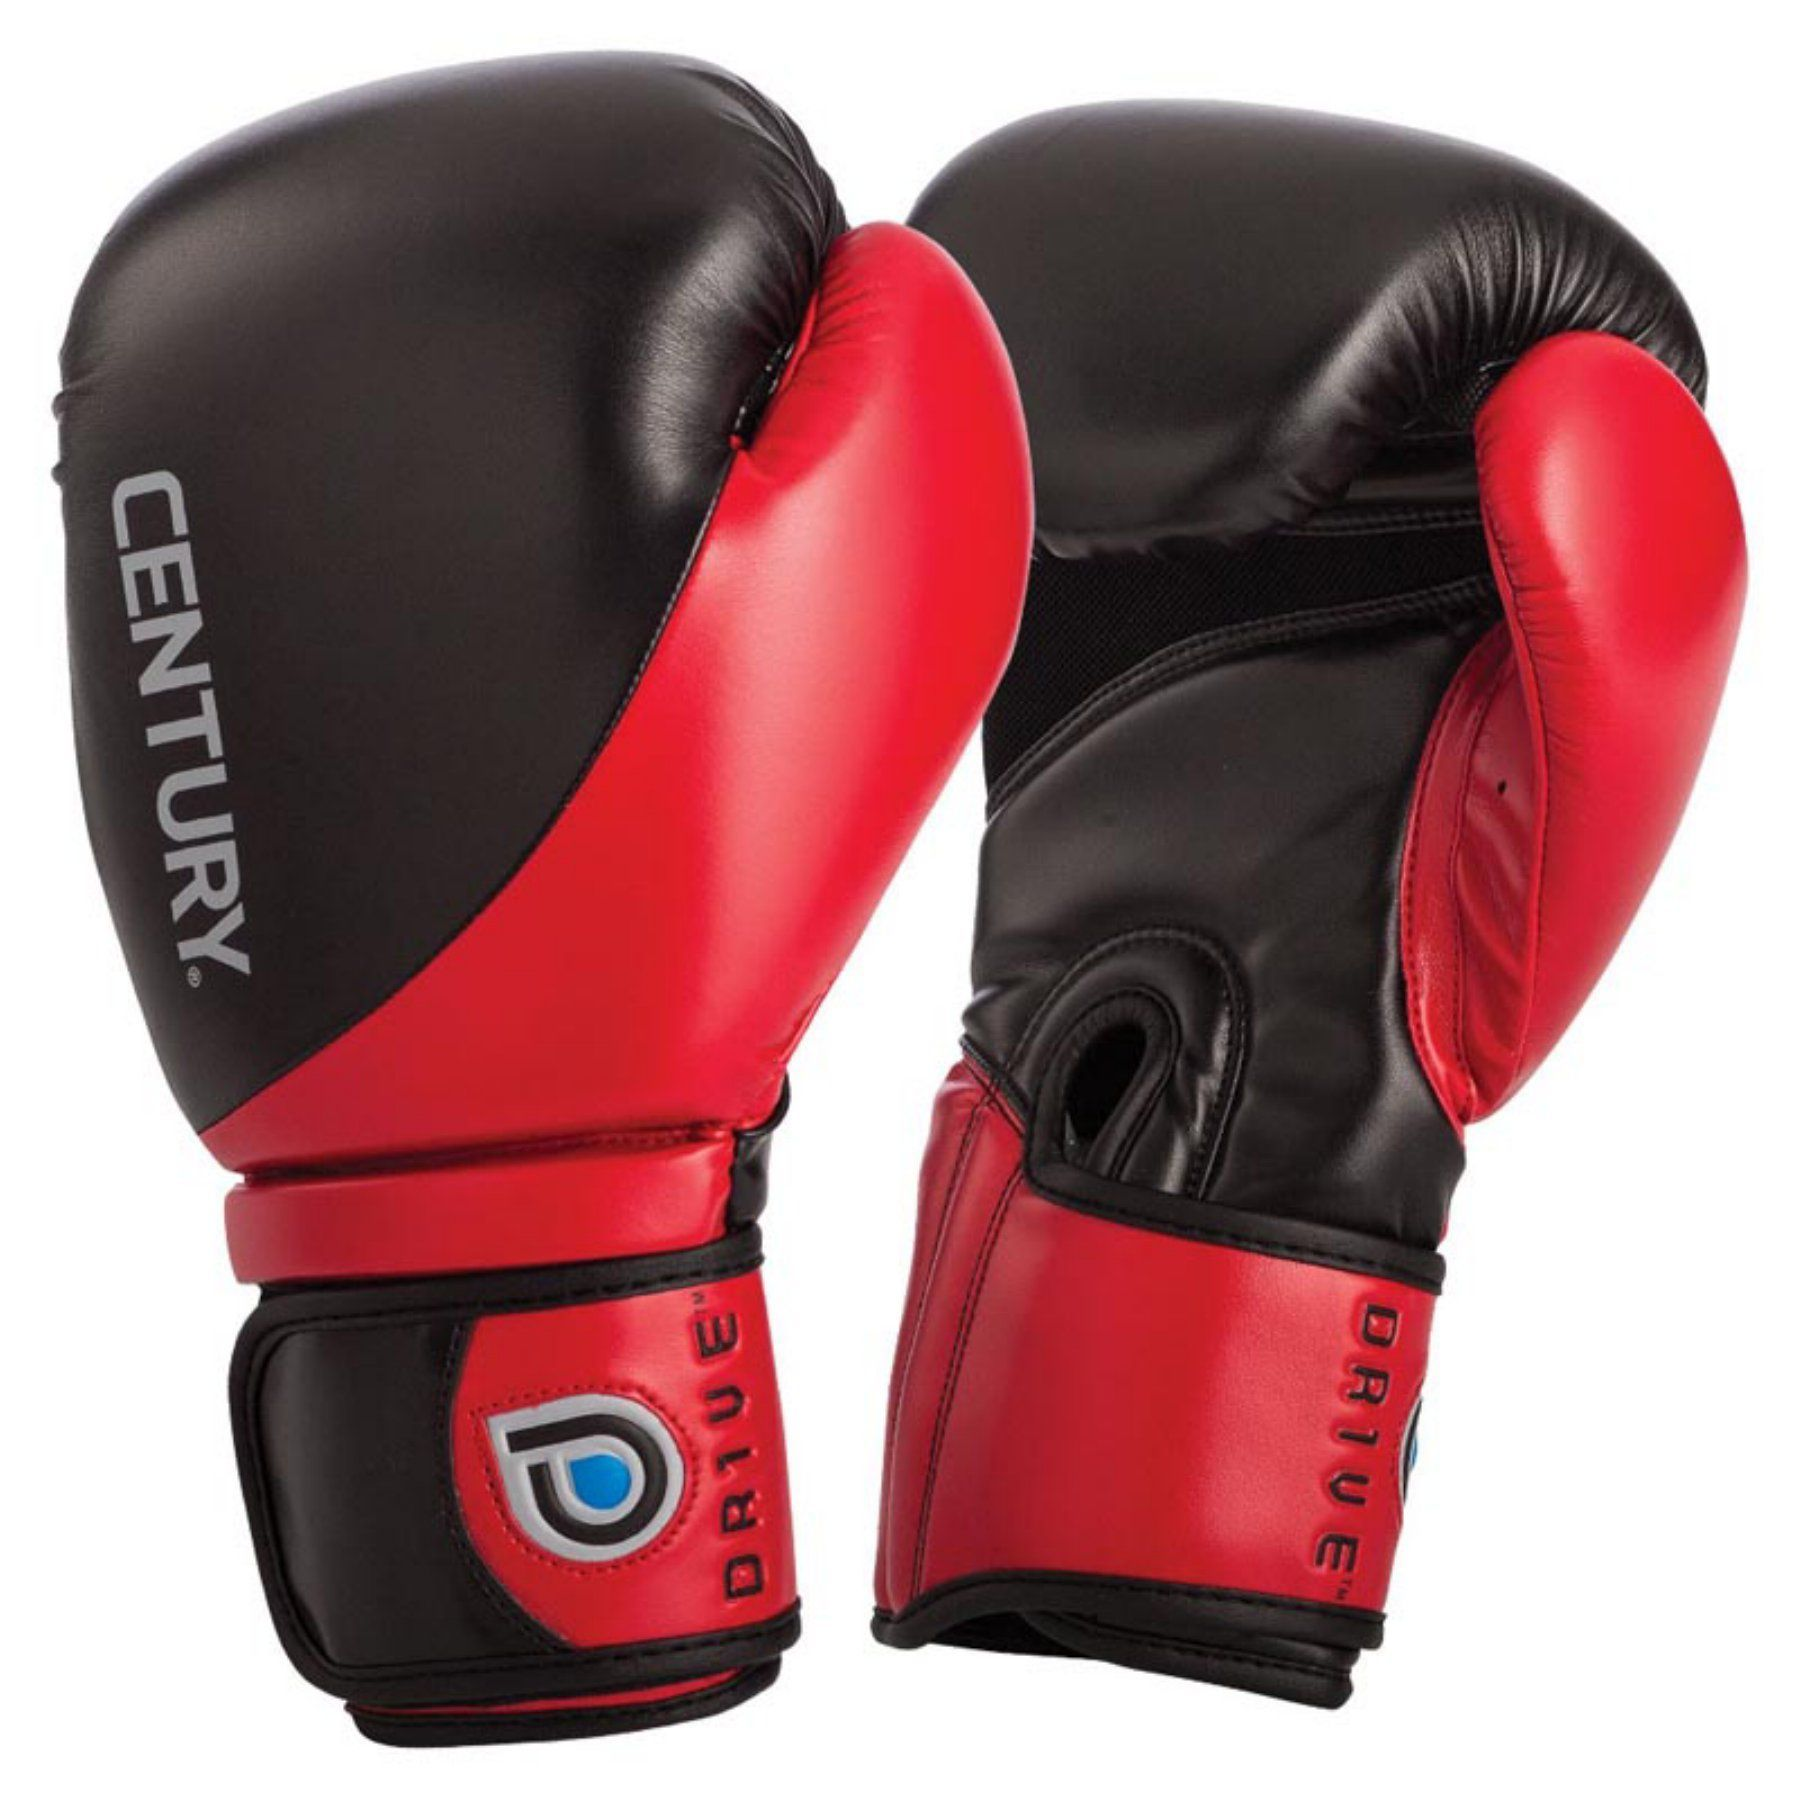 Century Drive Boxing Glove 141003P910714 Boxing